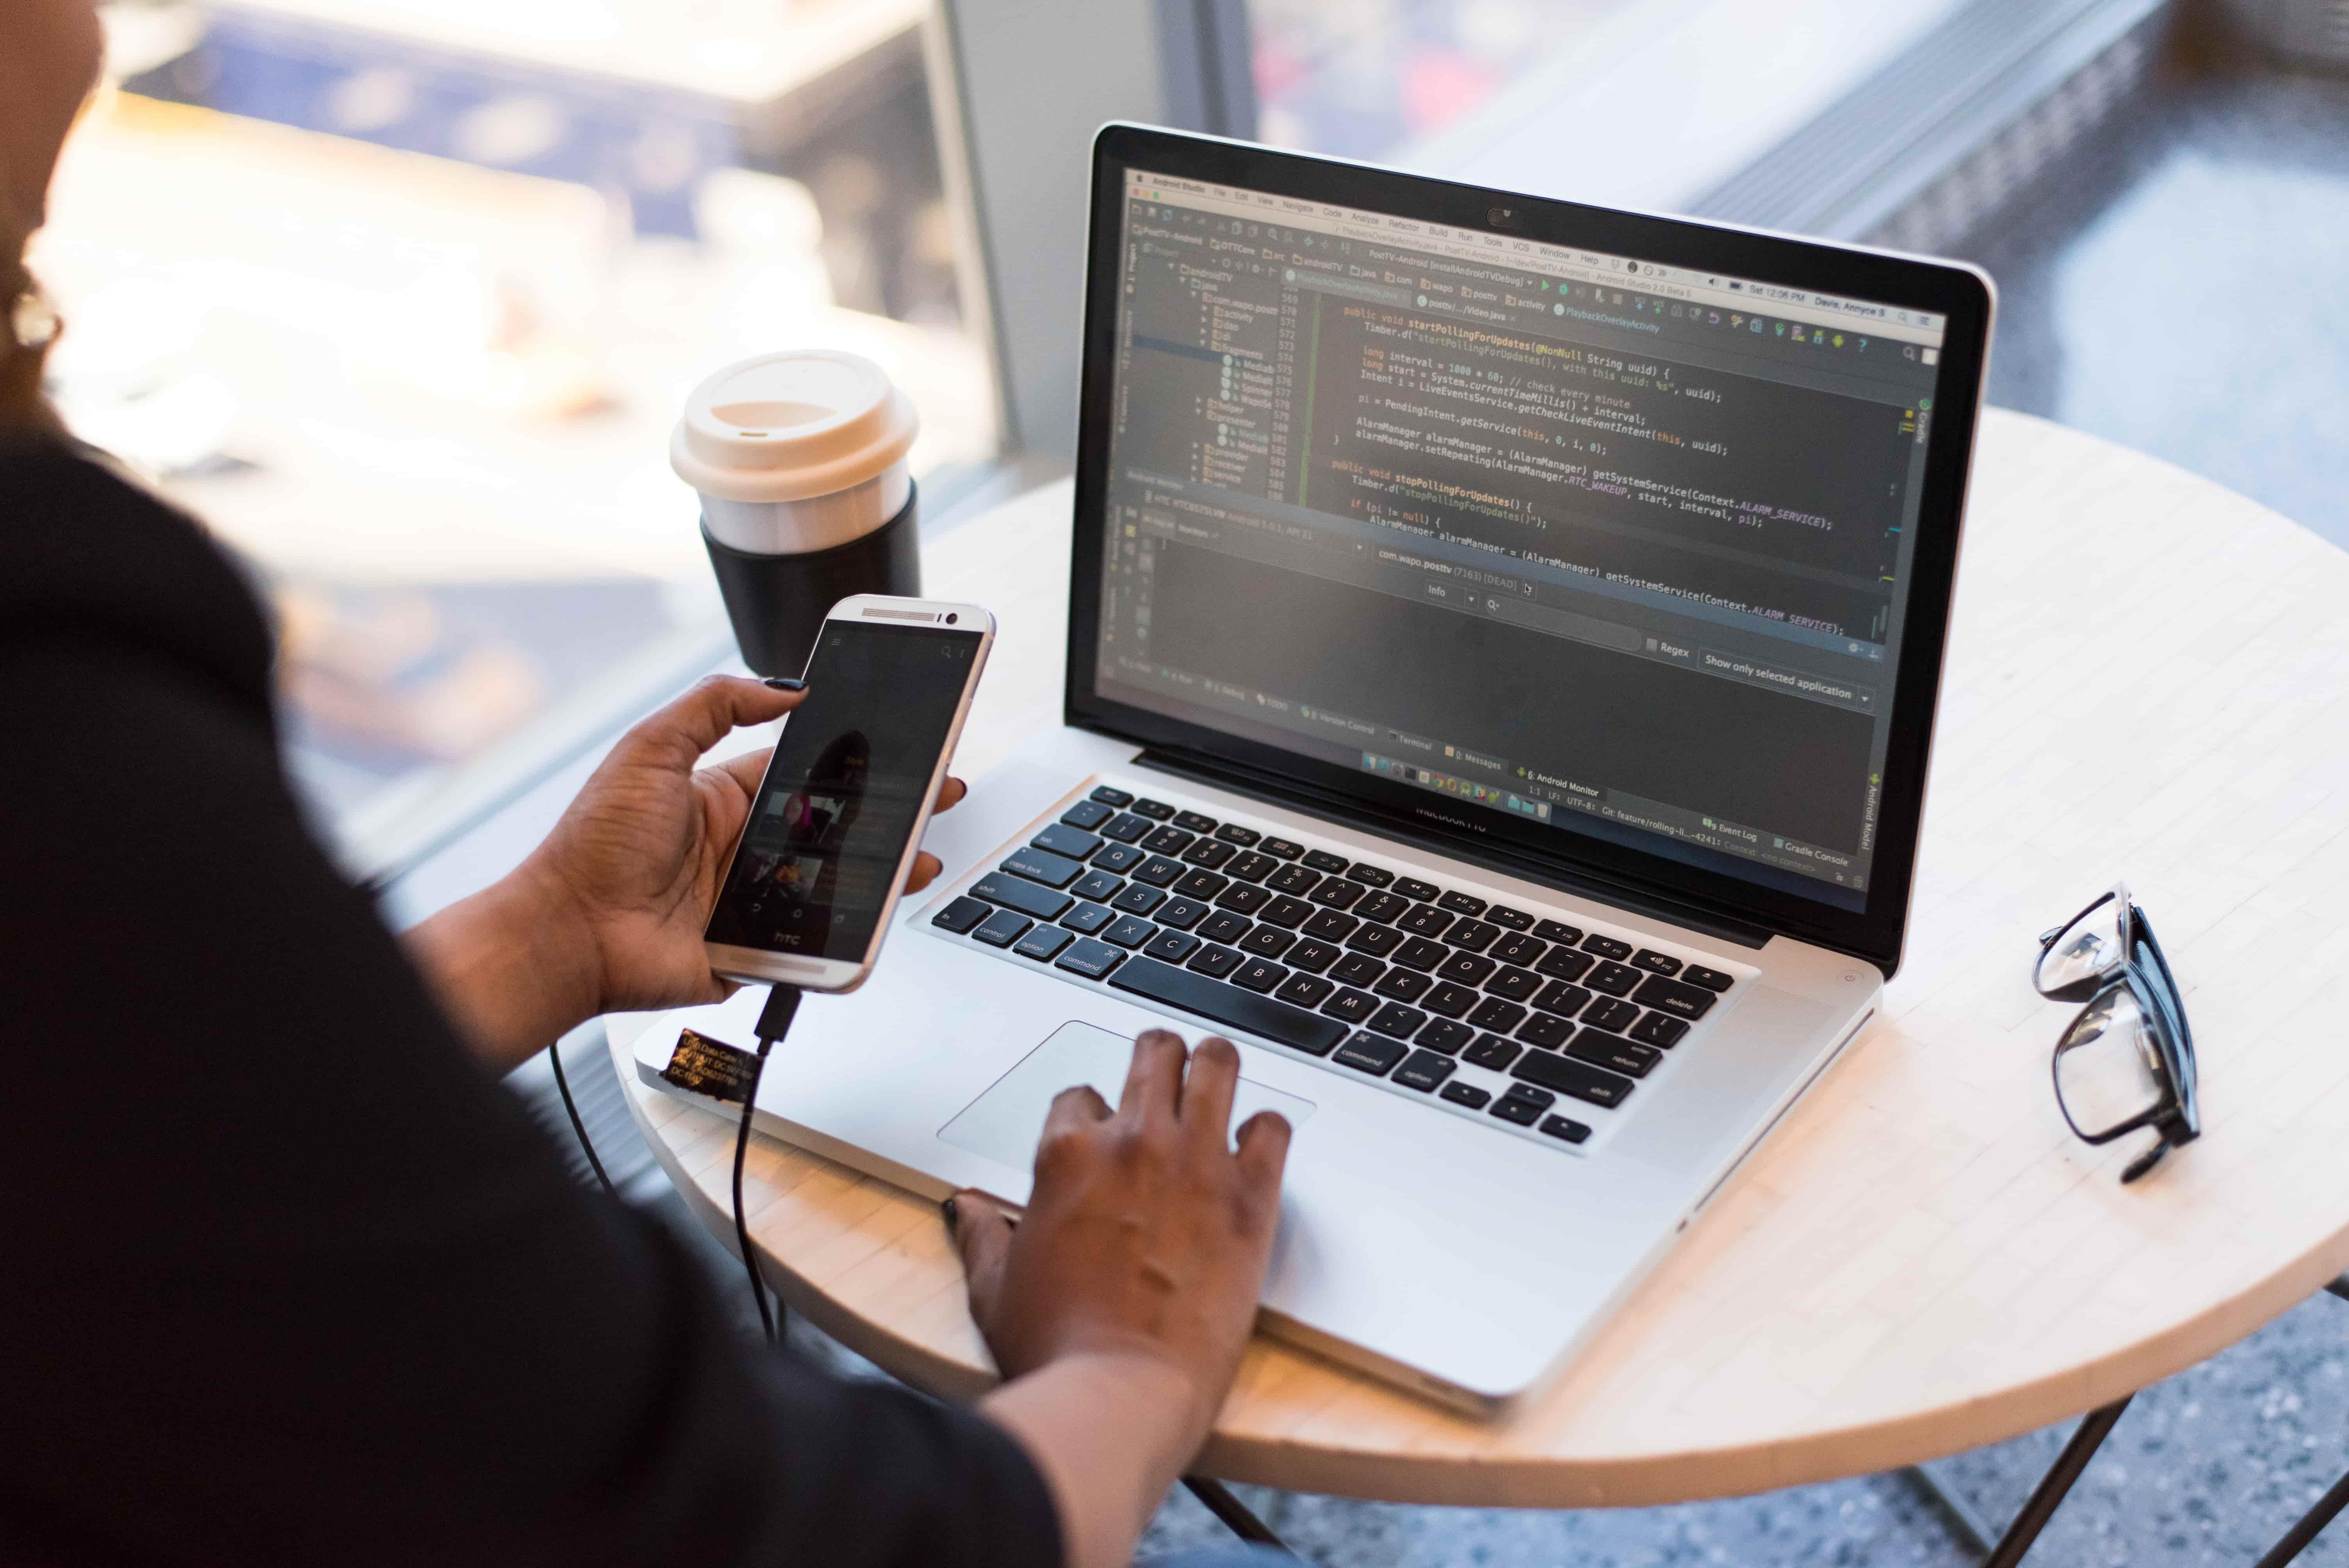 Software development mobile and desktop